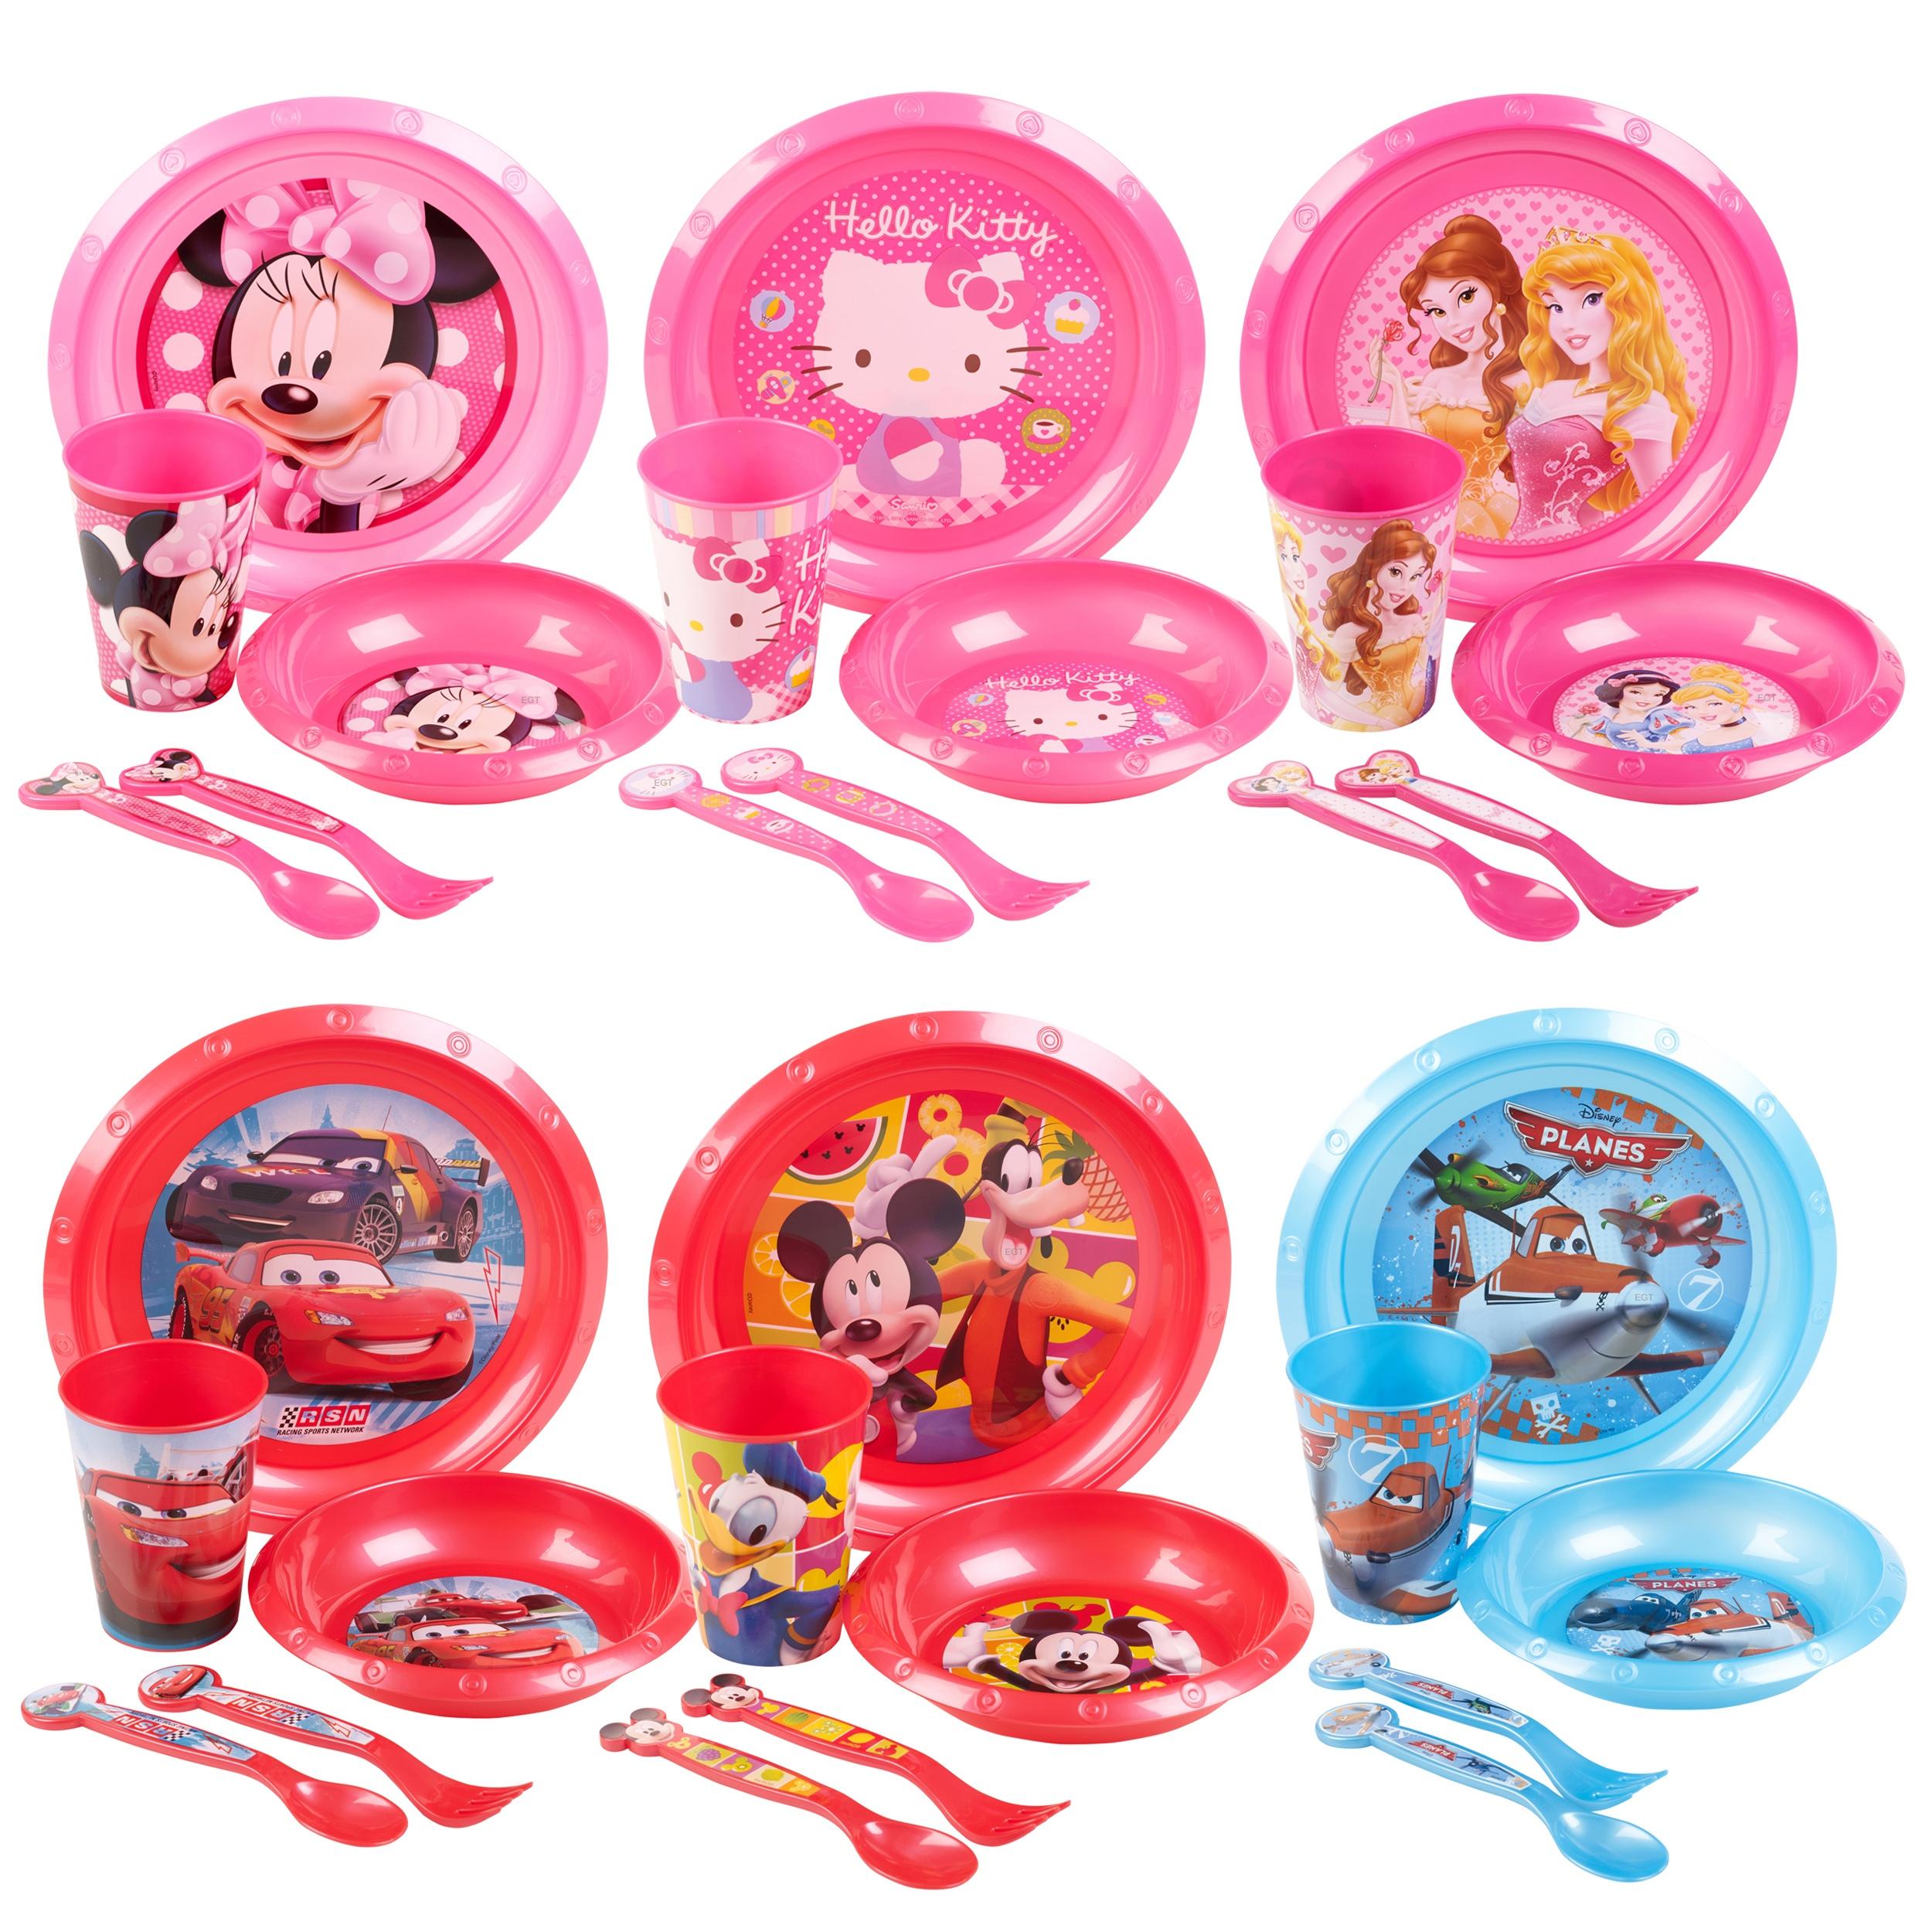 Kids 5 Piece Disney Breakfast Lunch Dinner Supper Plate Bowl Cup